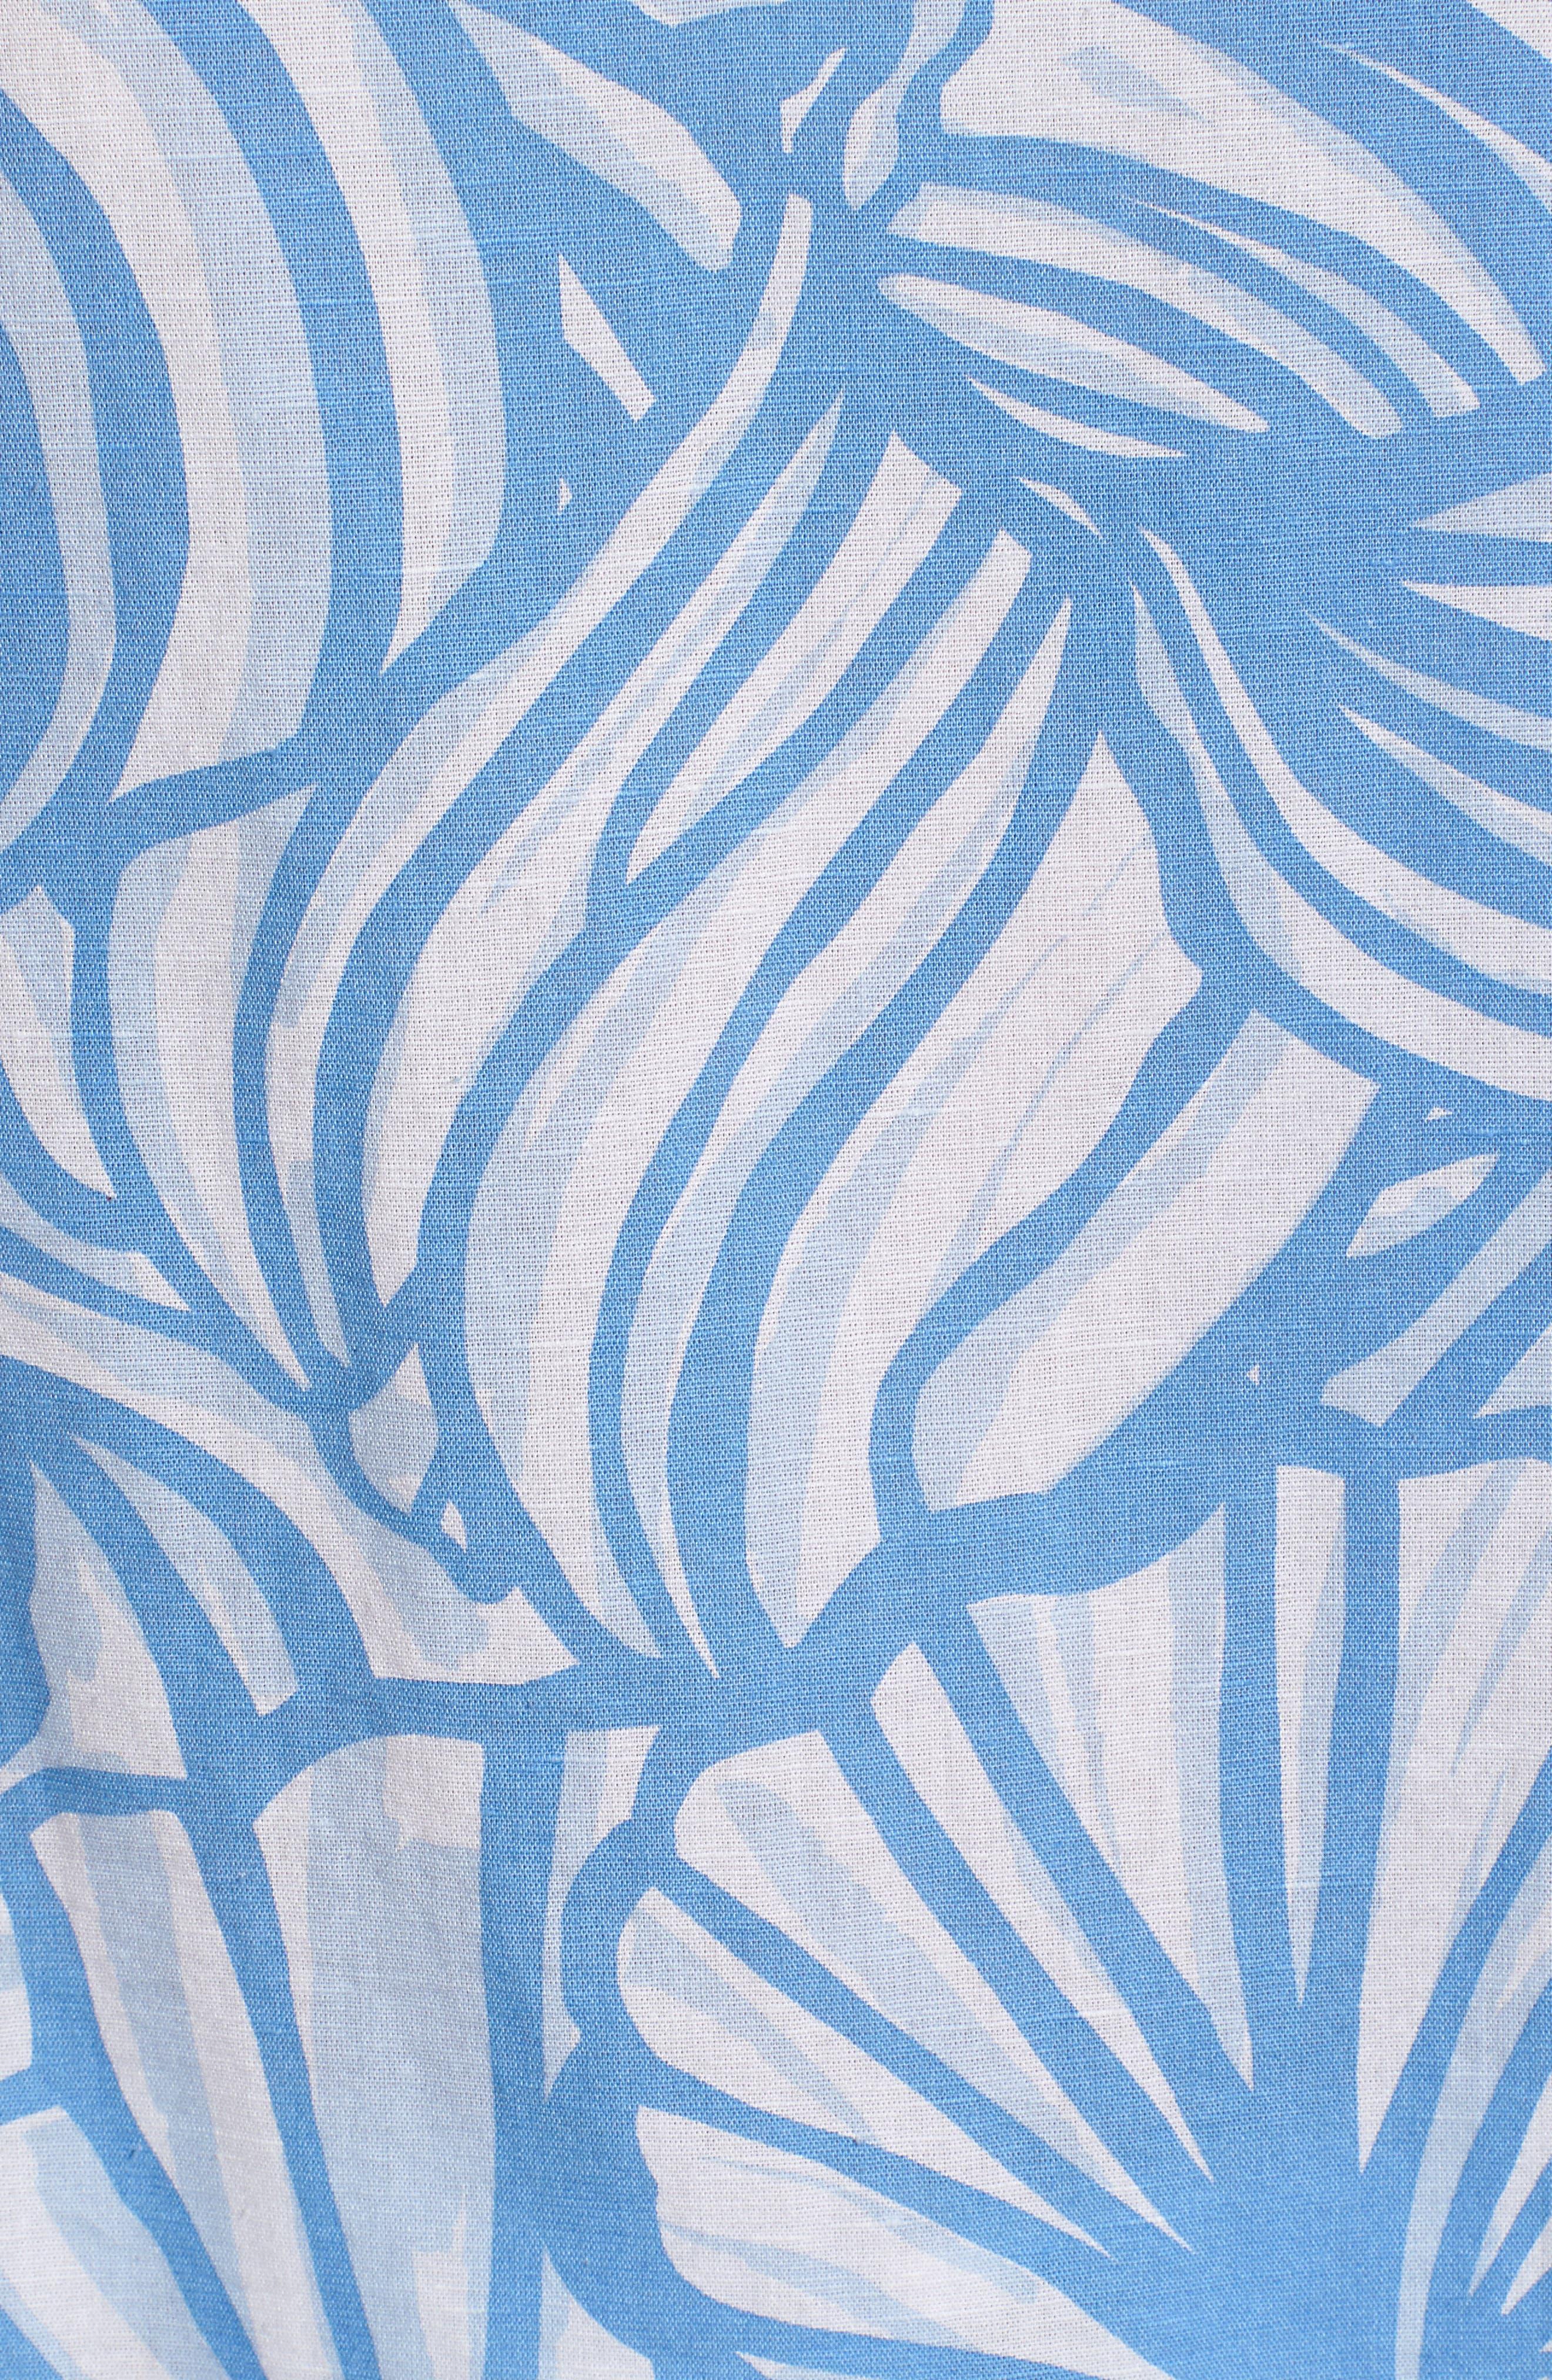 Nautilus Print Blouse,                             Alternate thumbnail 6, color,                             Cornflower